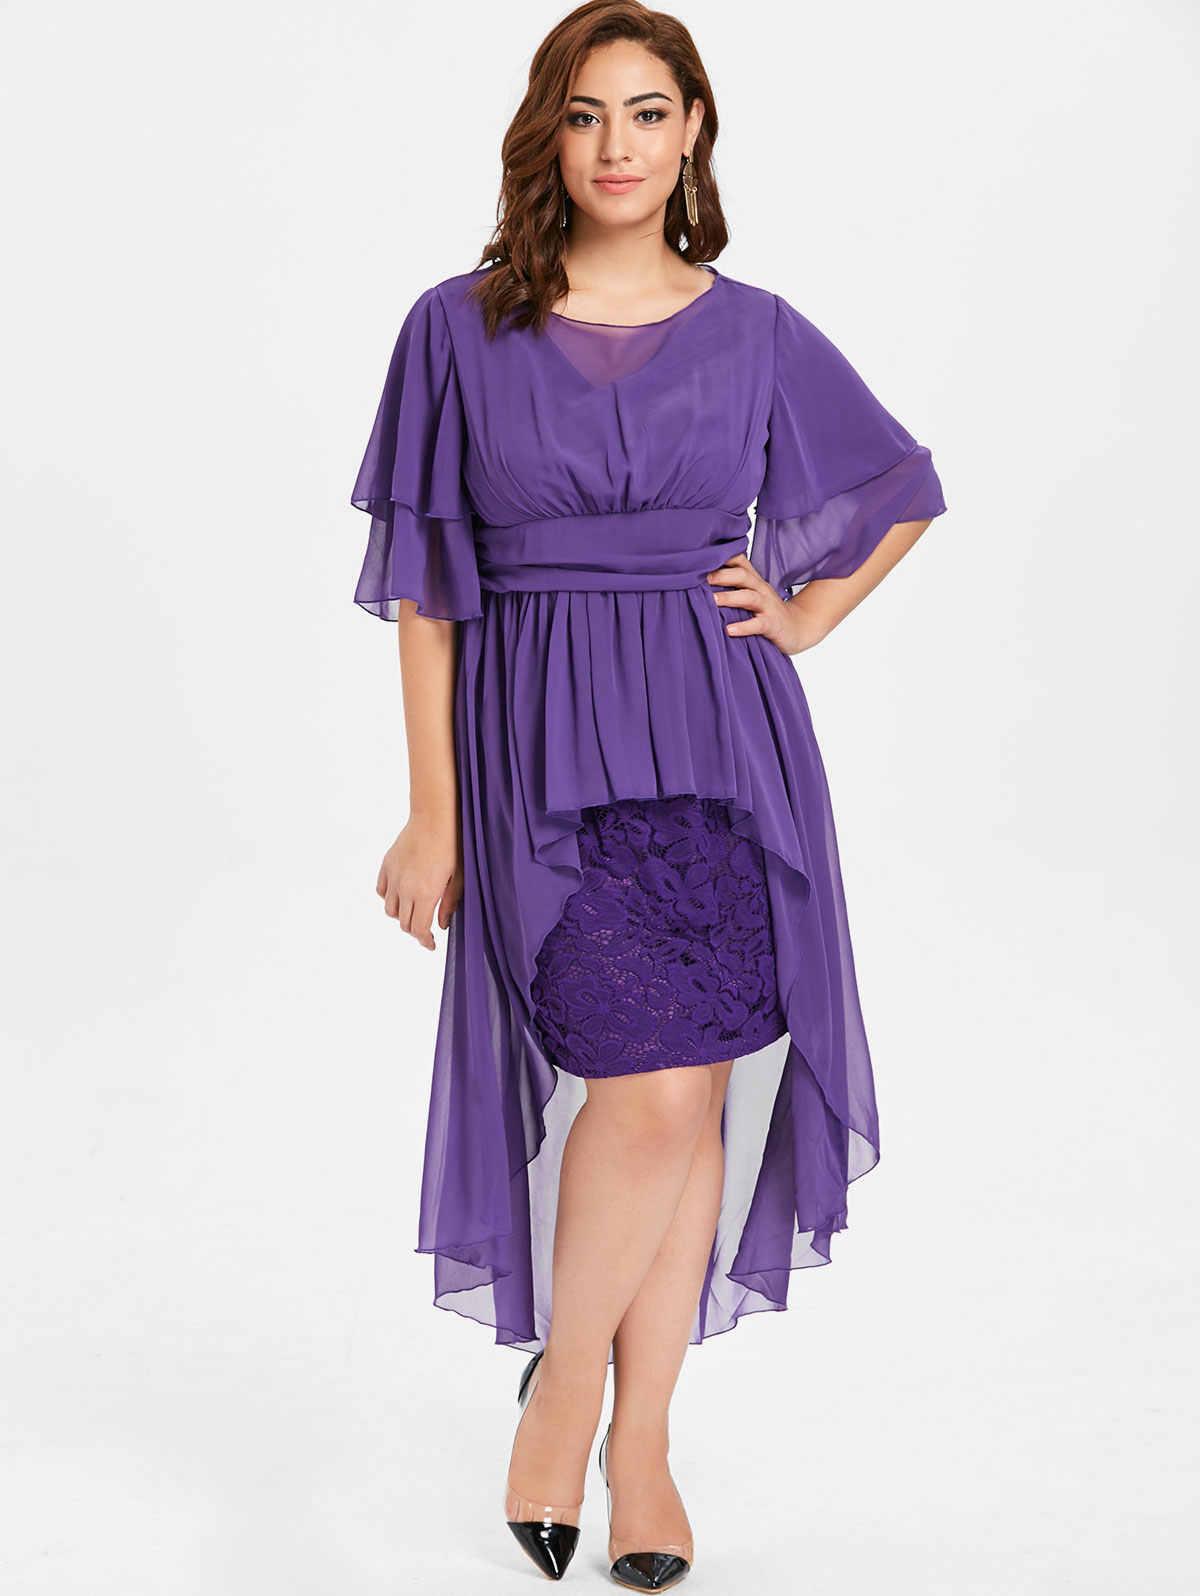 Wipalo Plus Size Elegant Party Dress High Waist Lace Panel High Low Dress Women Half Sleeves O Neck Mid-Calf Dress Vestidos 5XL